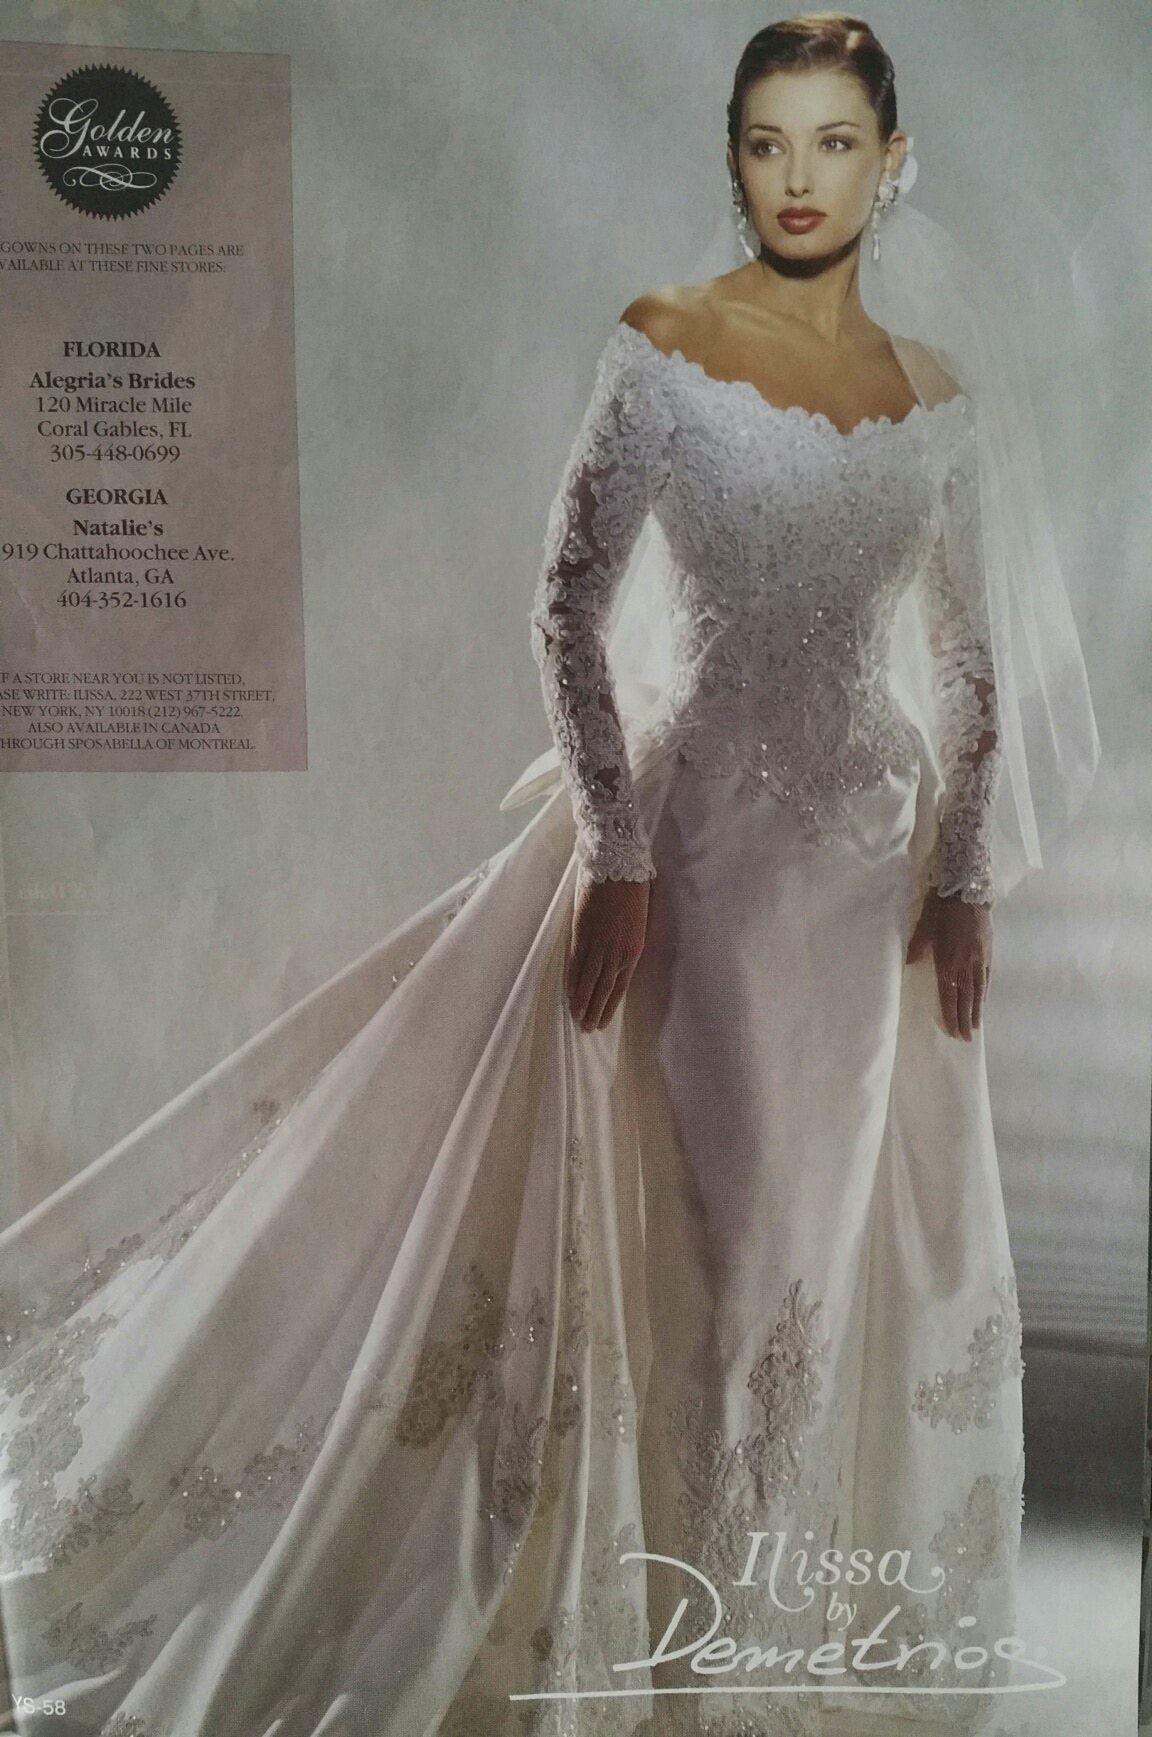 Demetrios 1995 in Brides Magazine | Demetrios 90\'s collections ...